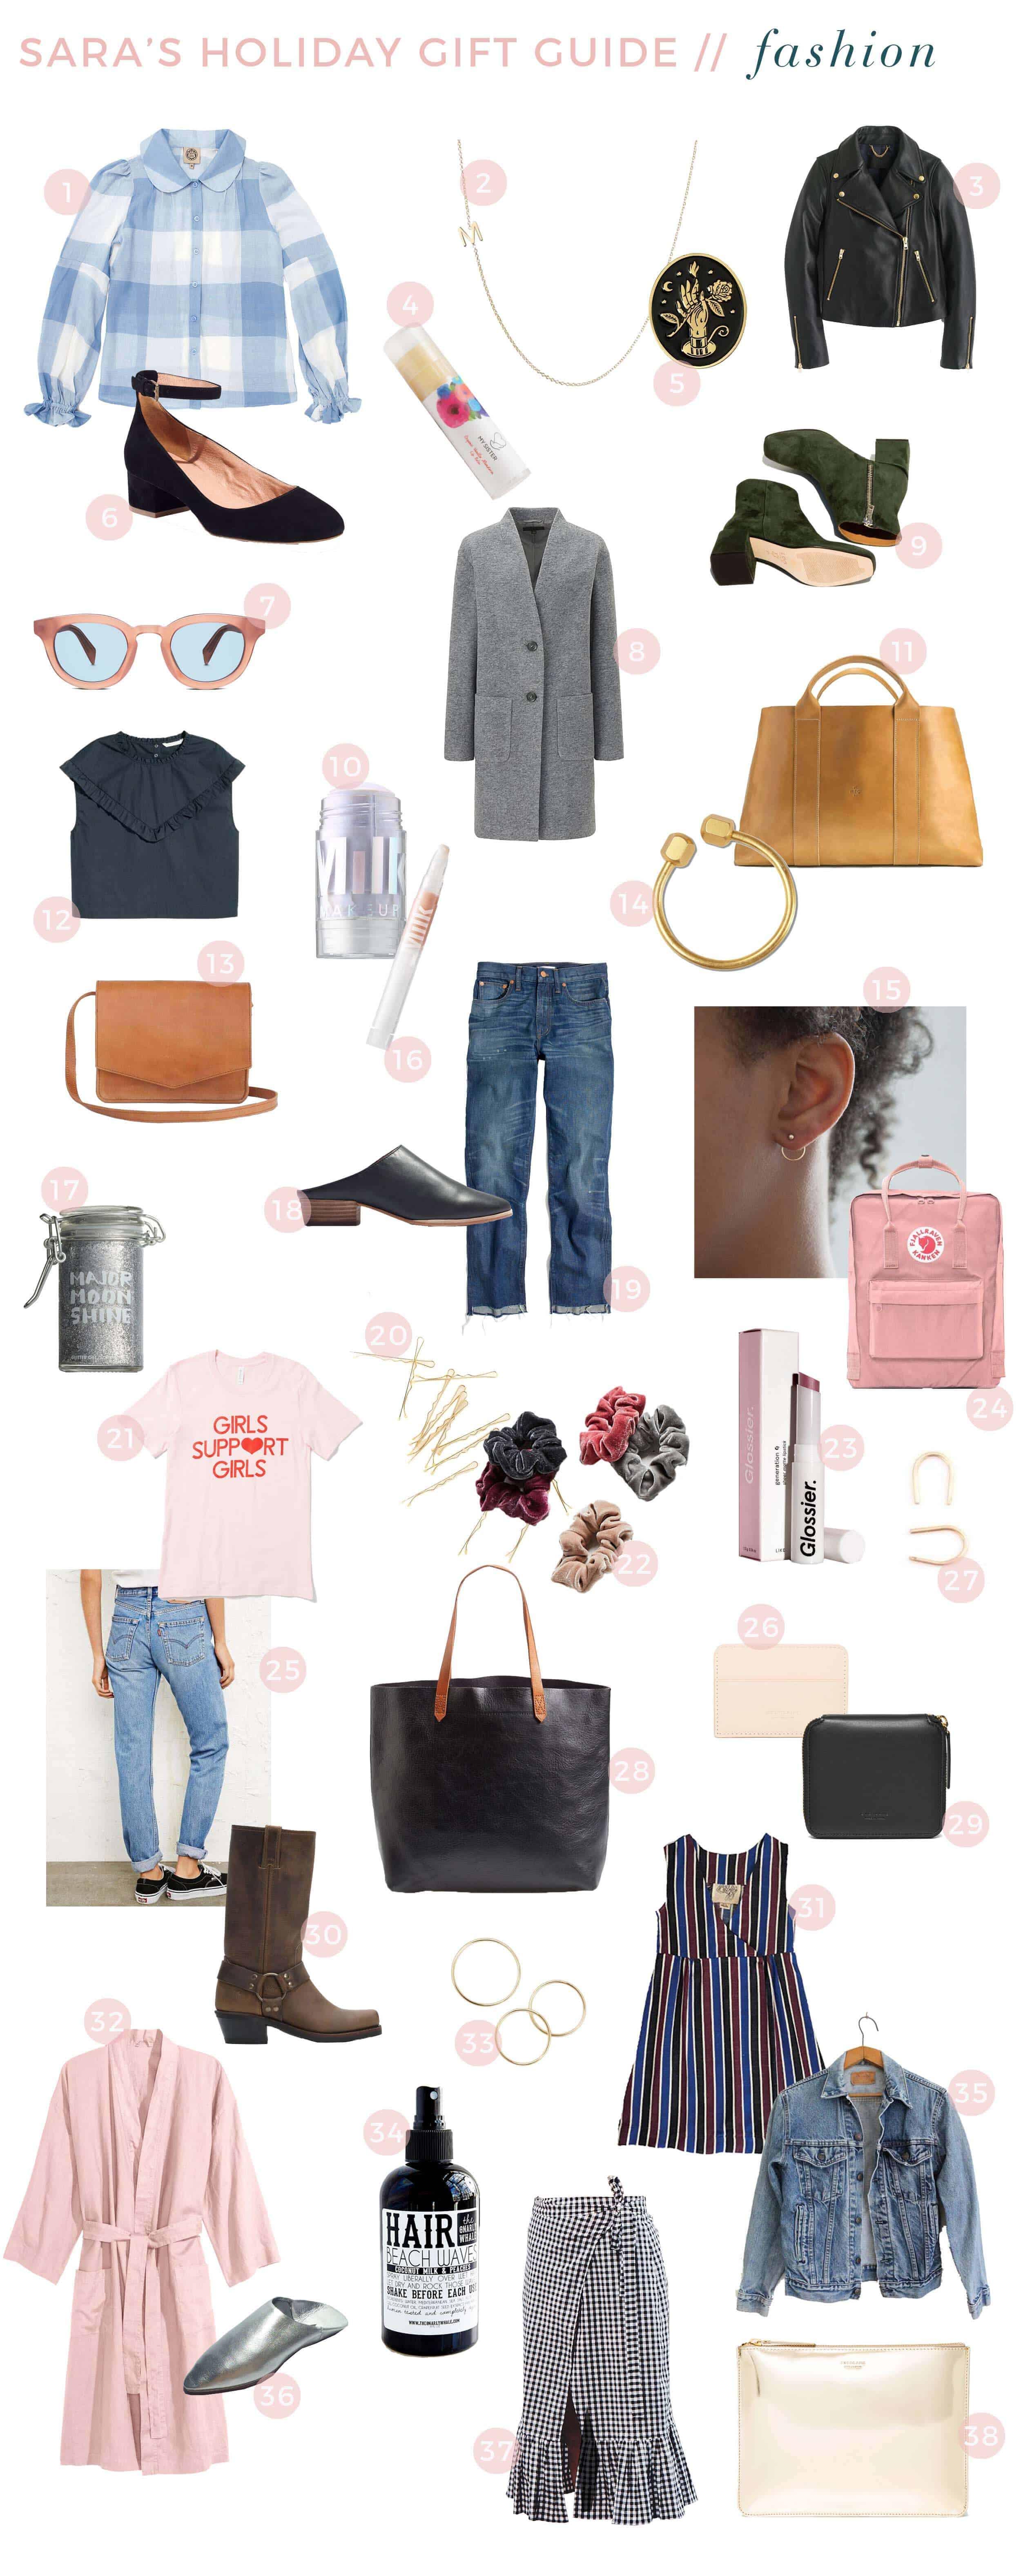 sara-tramp_holiday_gift-guide_2016_fashion_roundup